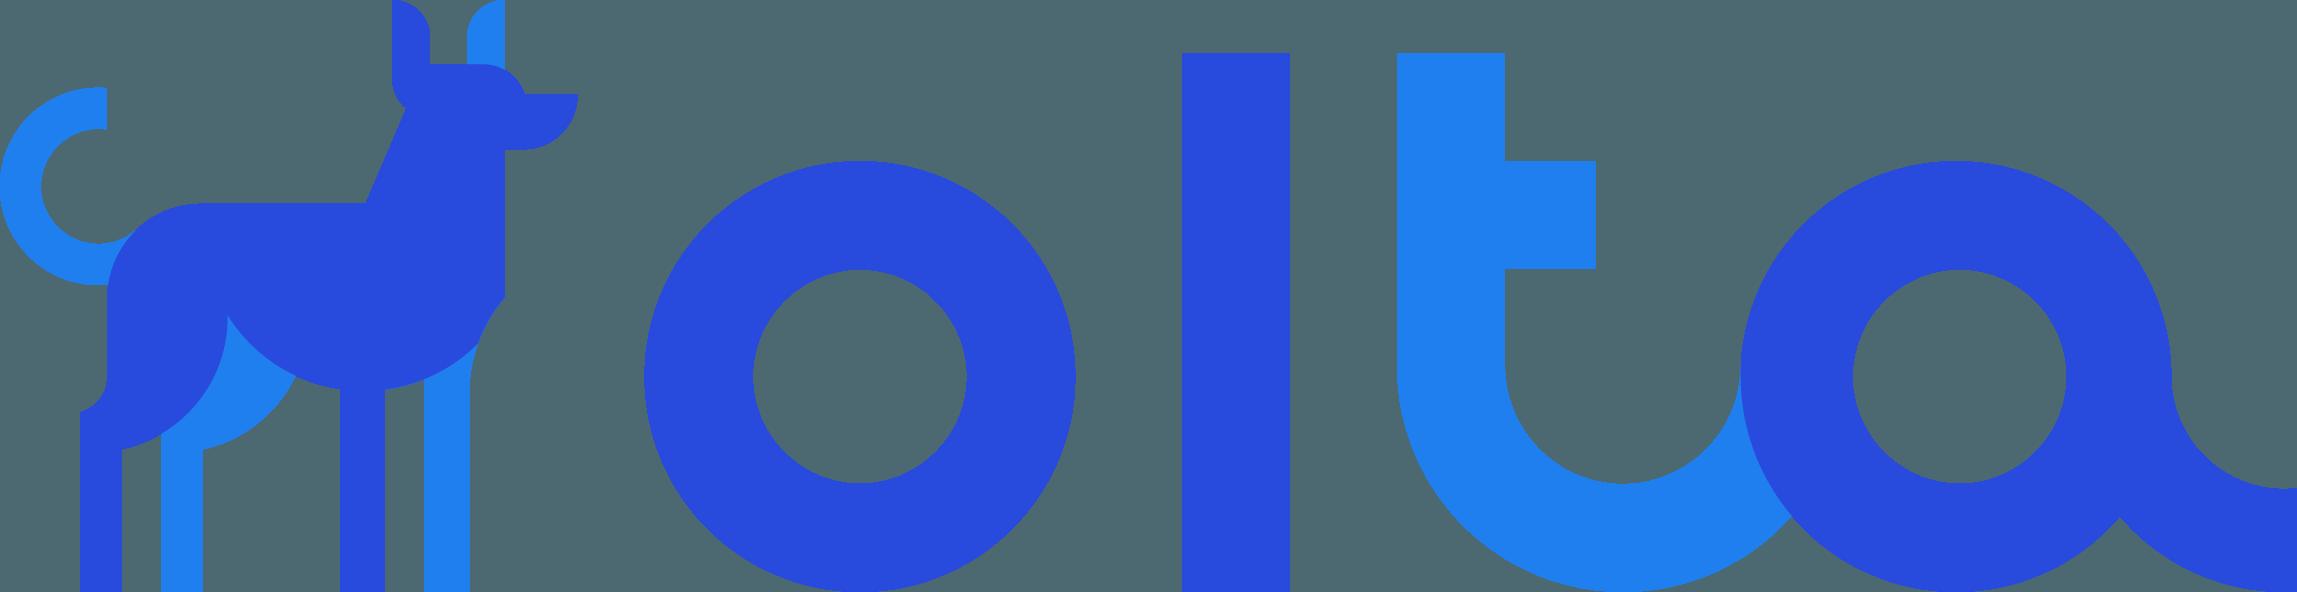 OLTA株式会社 様